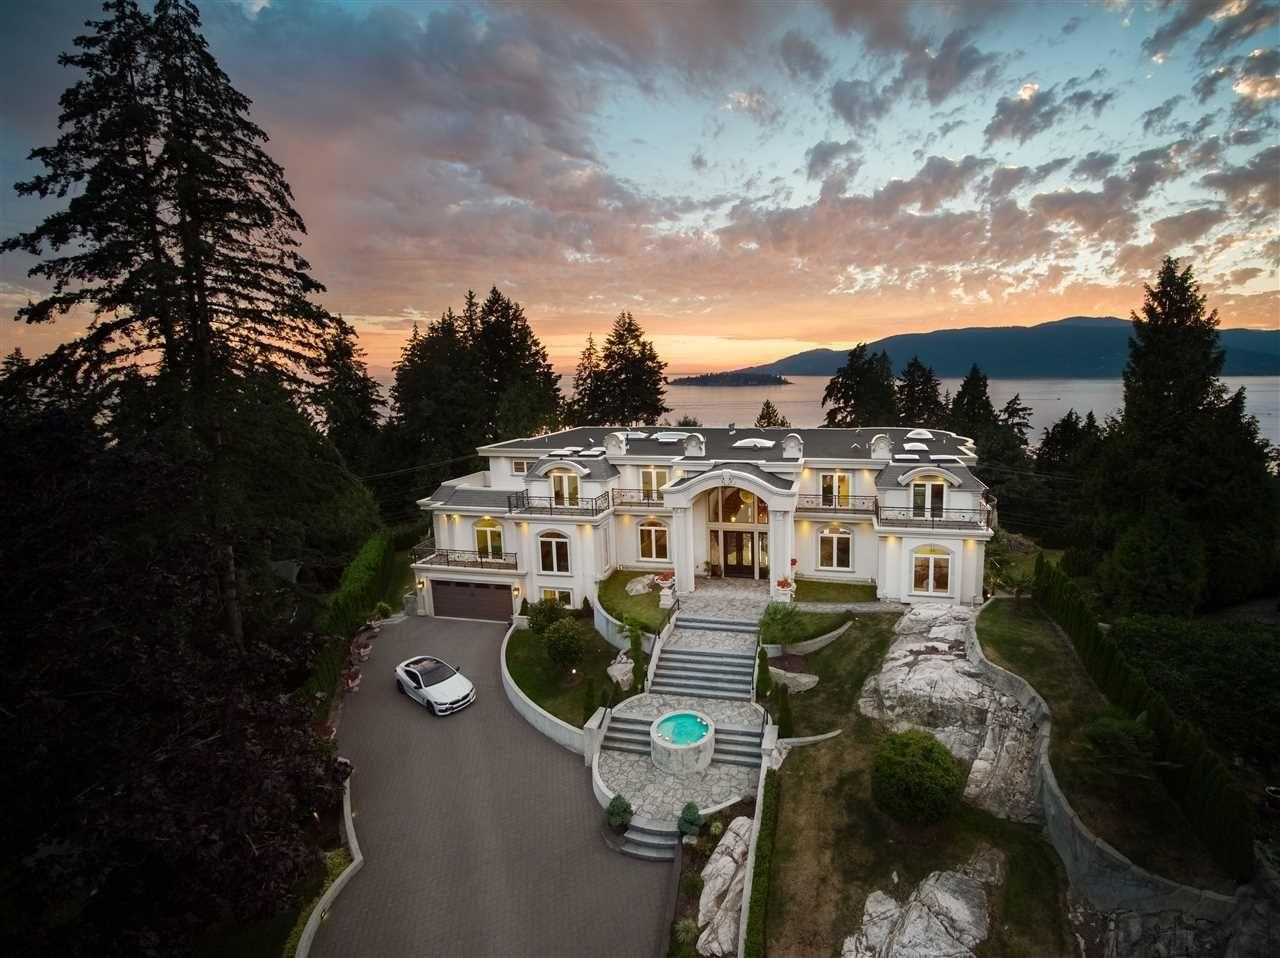 Main Photo: 5358 KENSINGTON Crescent in West Vancouver: Caulfeild House for sale : MLS®# R2608024